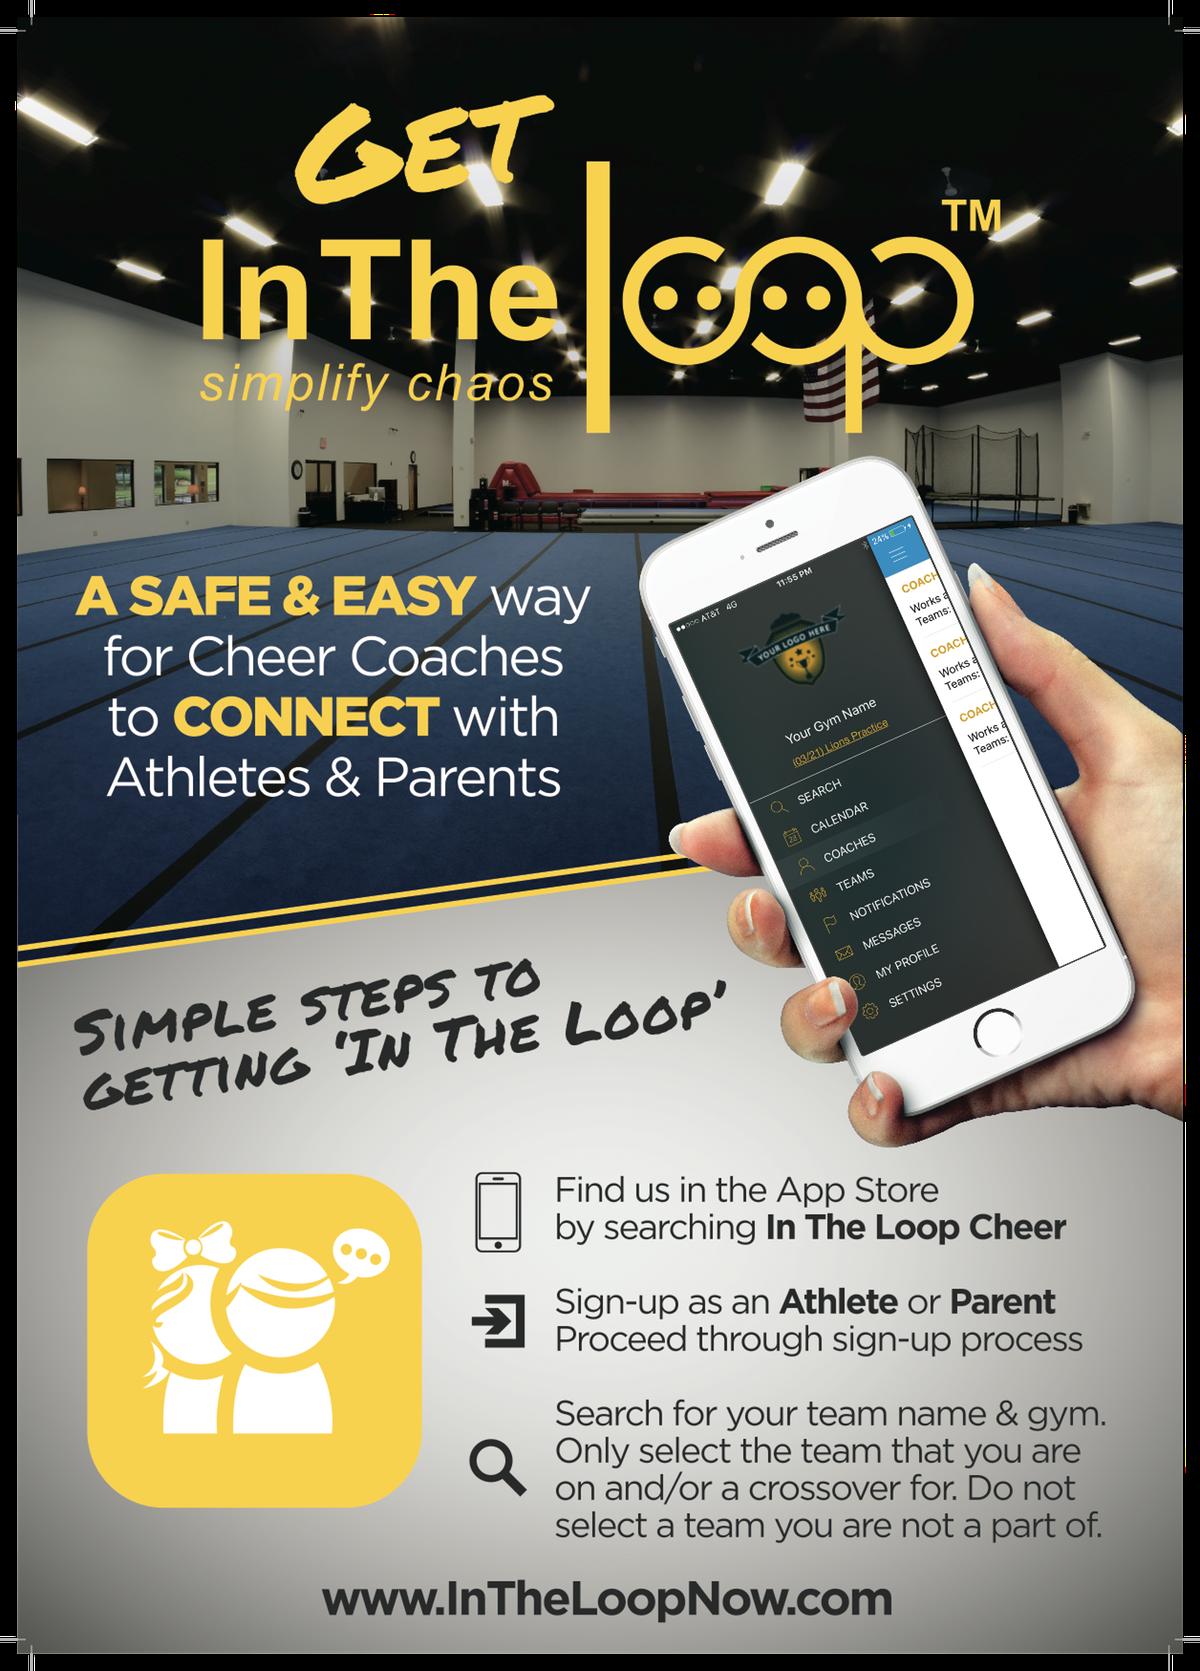 Mobile App Download Instructions Flyer/Poster